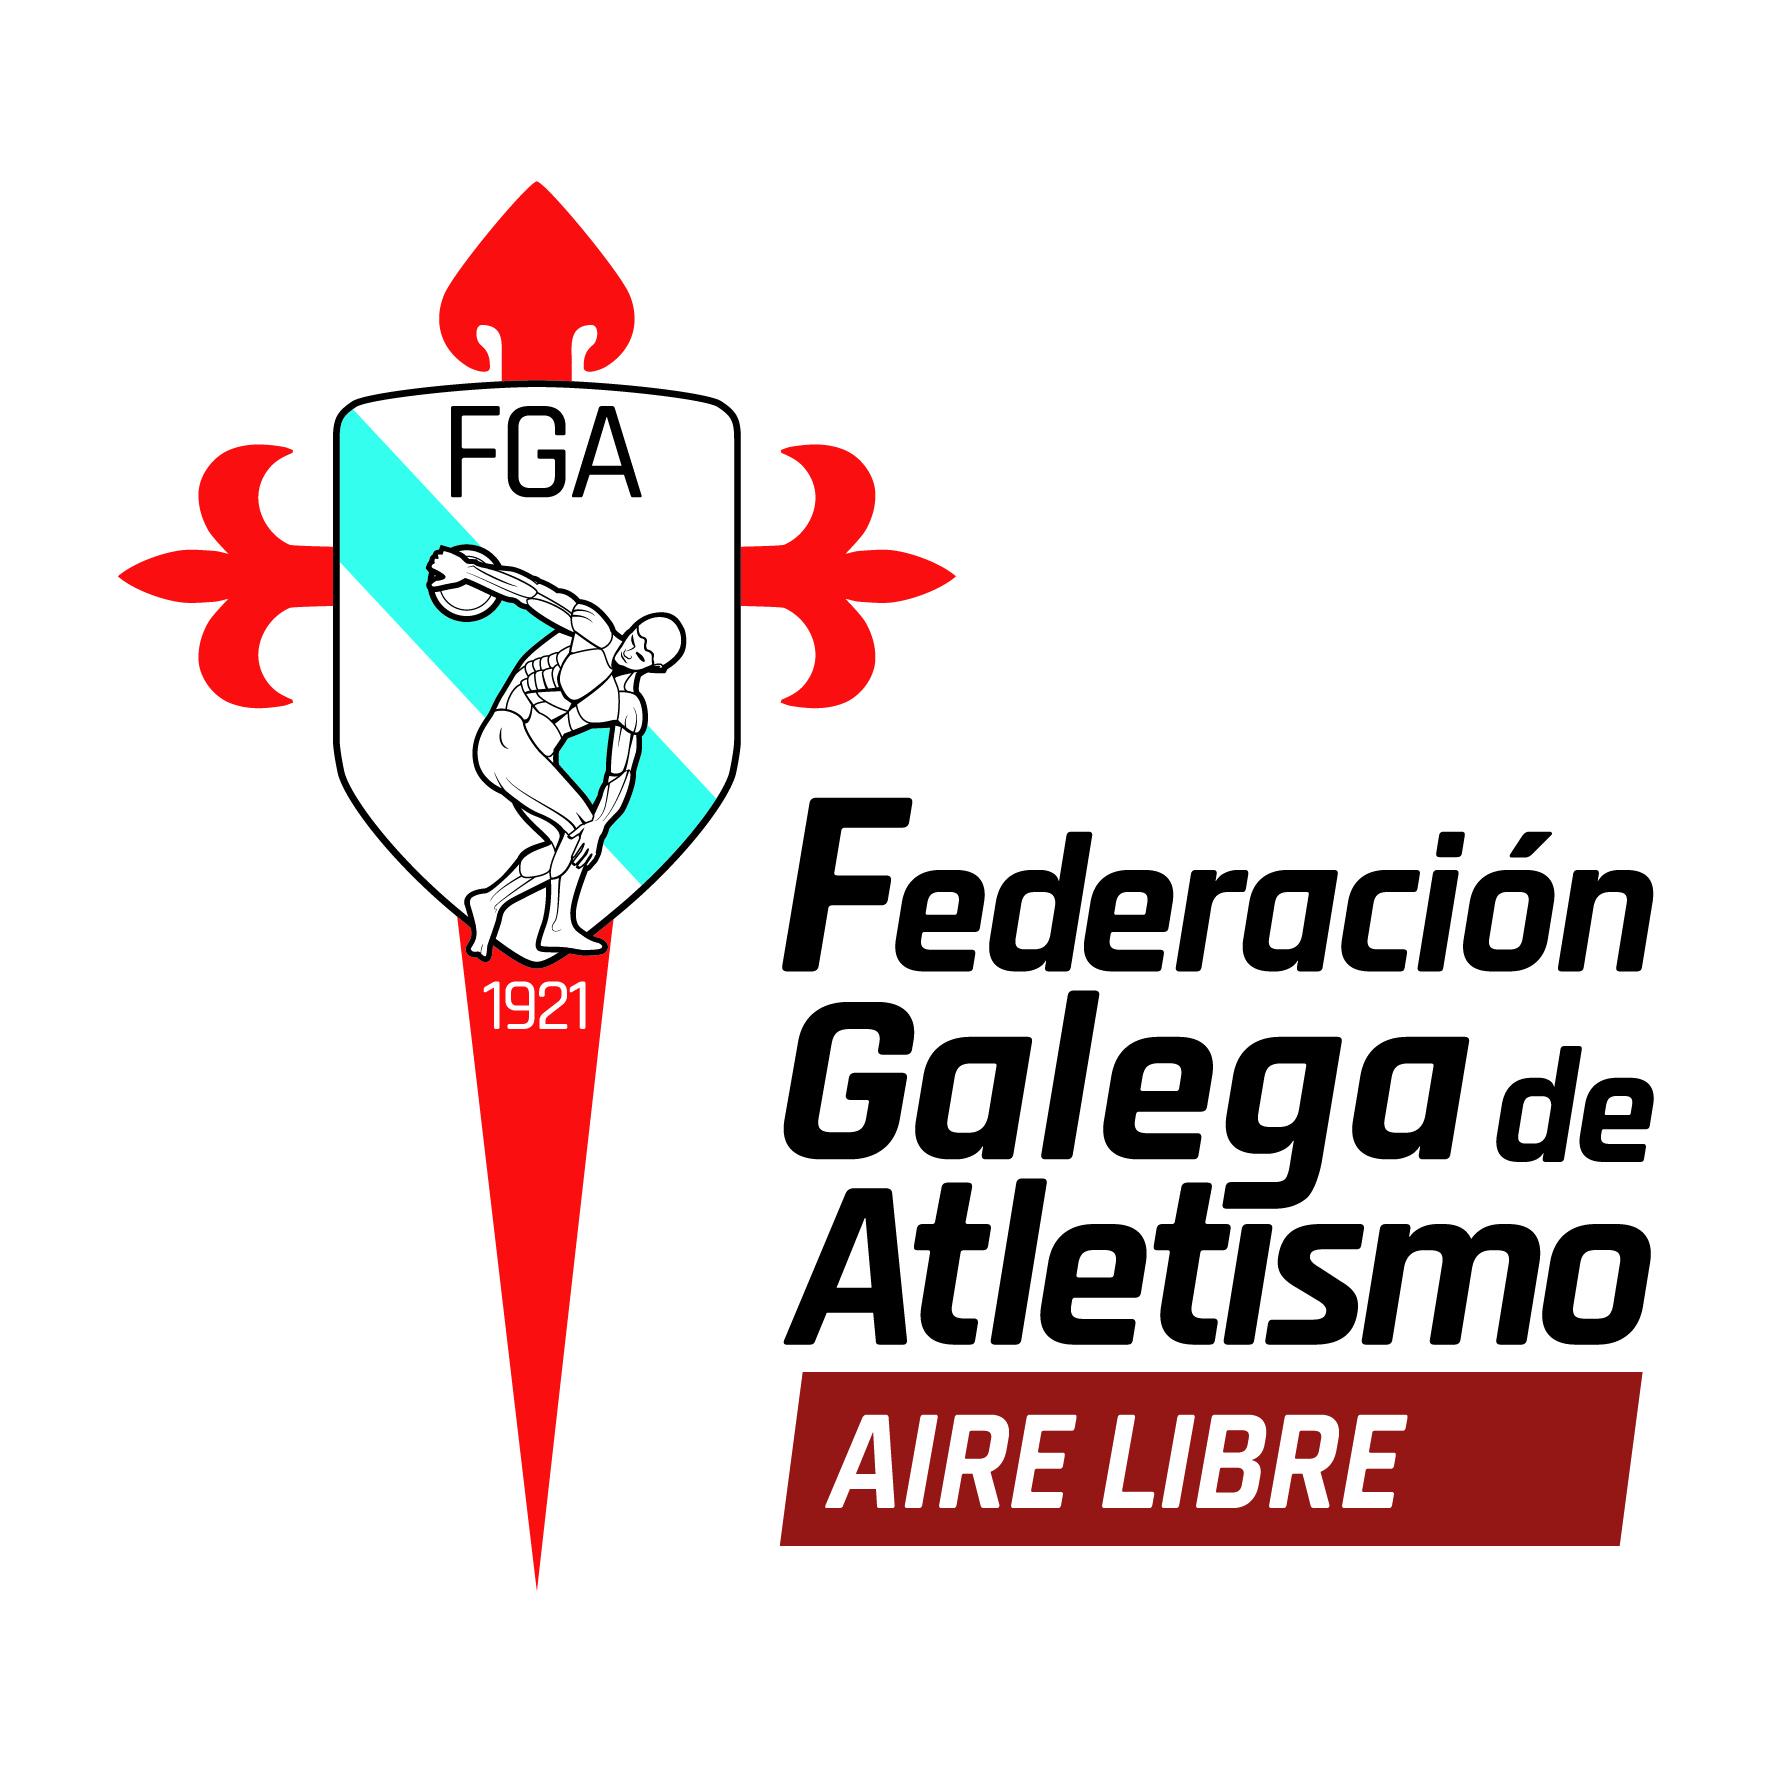 Campionato de Galicia de 5.000 m. Sub20 Mulleres e Sub18 Homes – 10.000 m. Sub20 – Sub23 – ABS – Máster 2017/2018